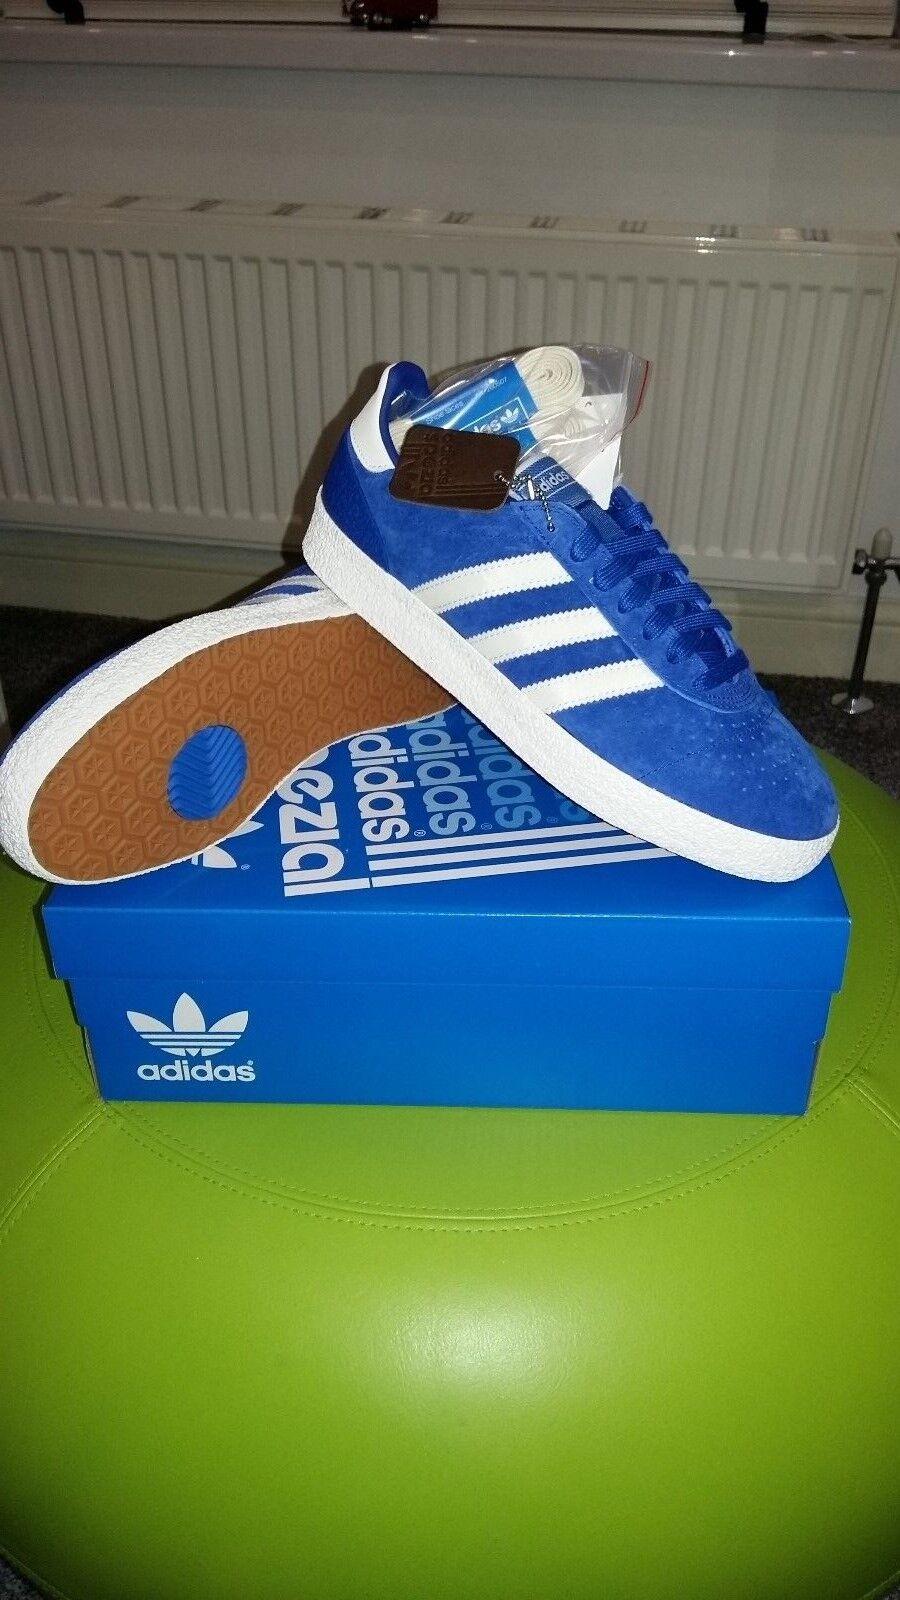 Adidas Munchen Super spzl Originals.. Unisex terracestrainers tamaño 7uk  3